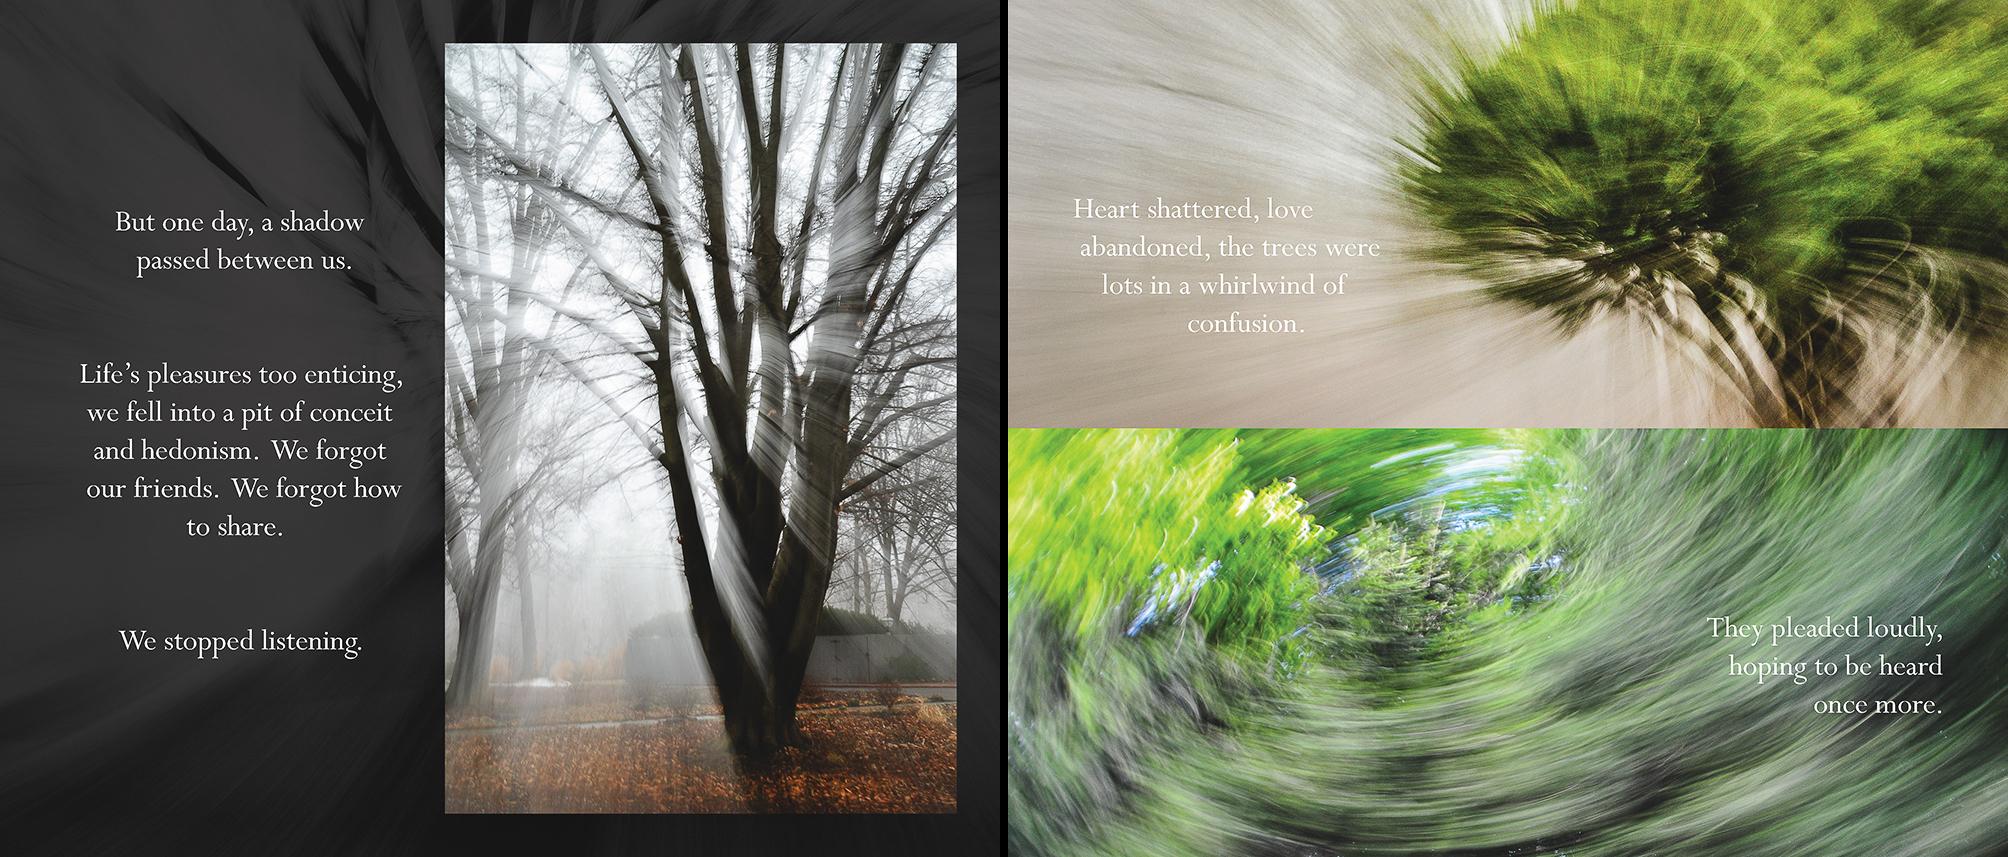 Carlin - Tree Whispers v2012_Page_11-12.jpg